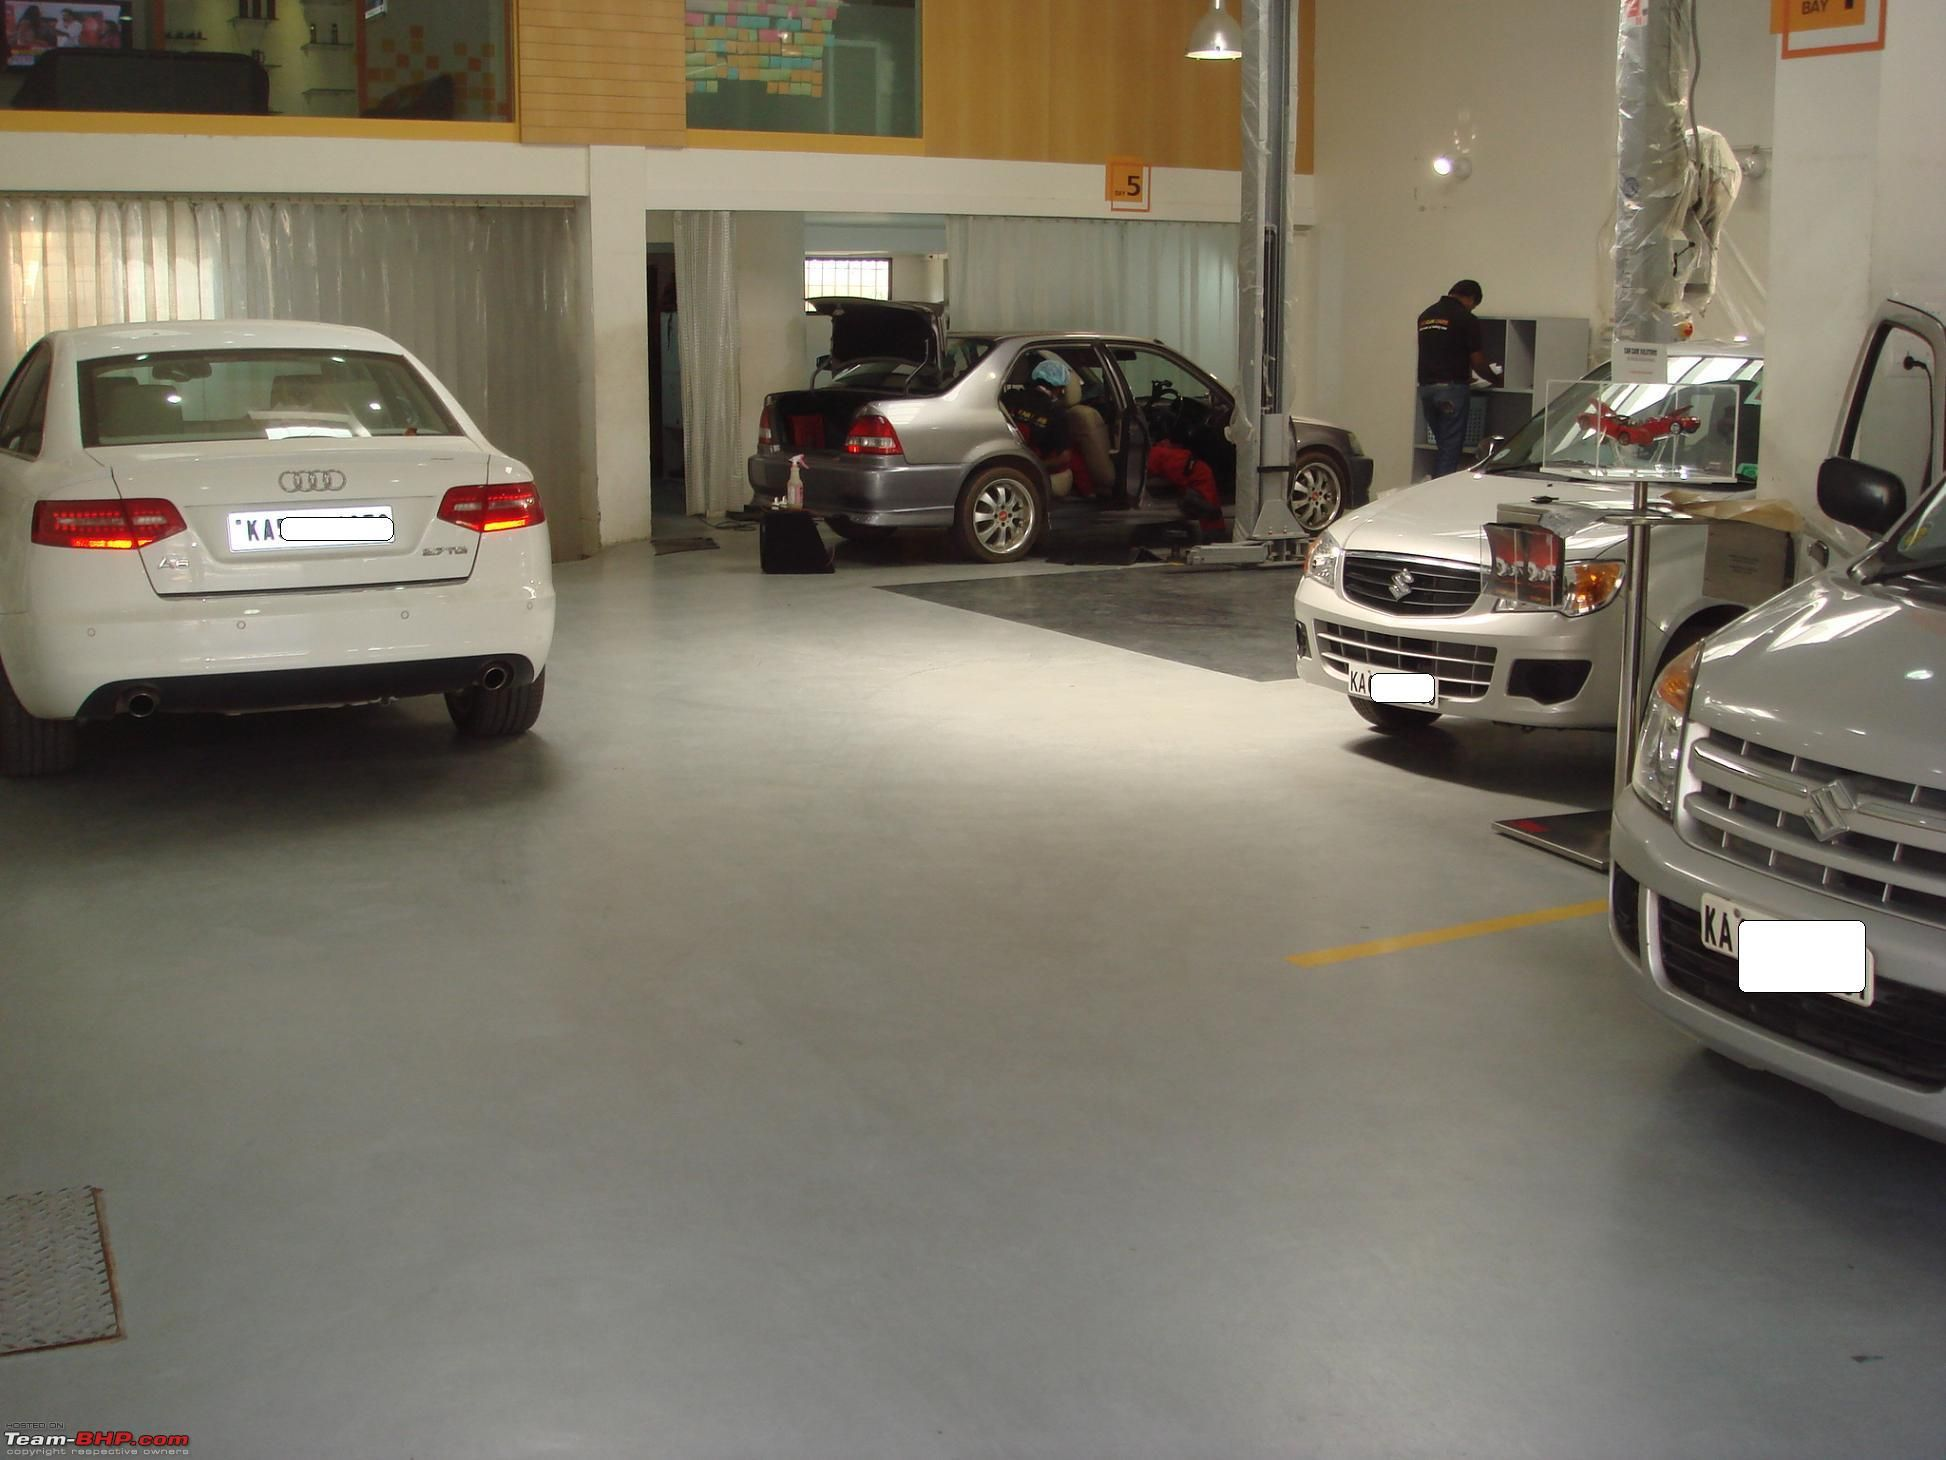 pics the 3m car care sun film on my car interior of the care center ...